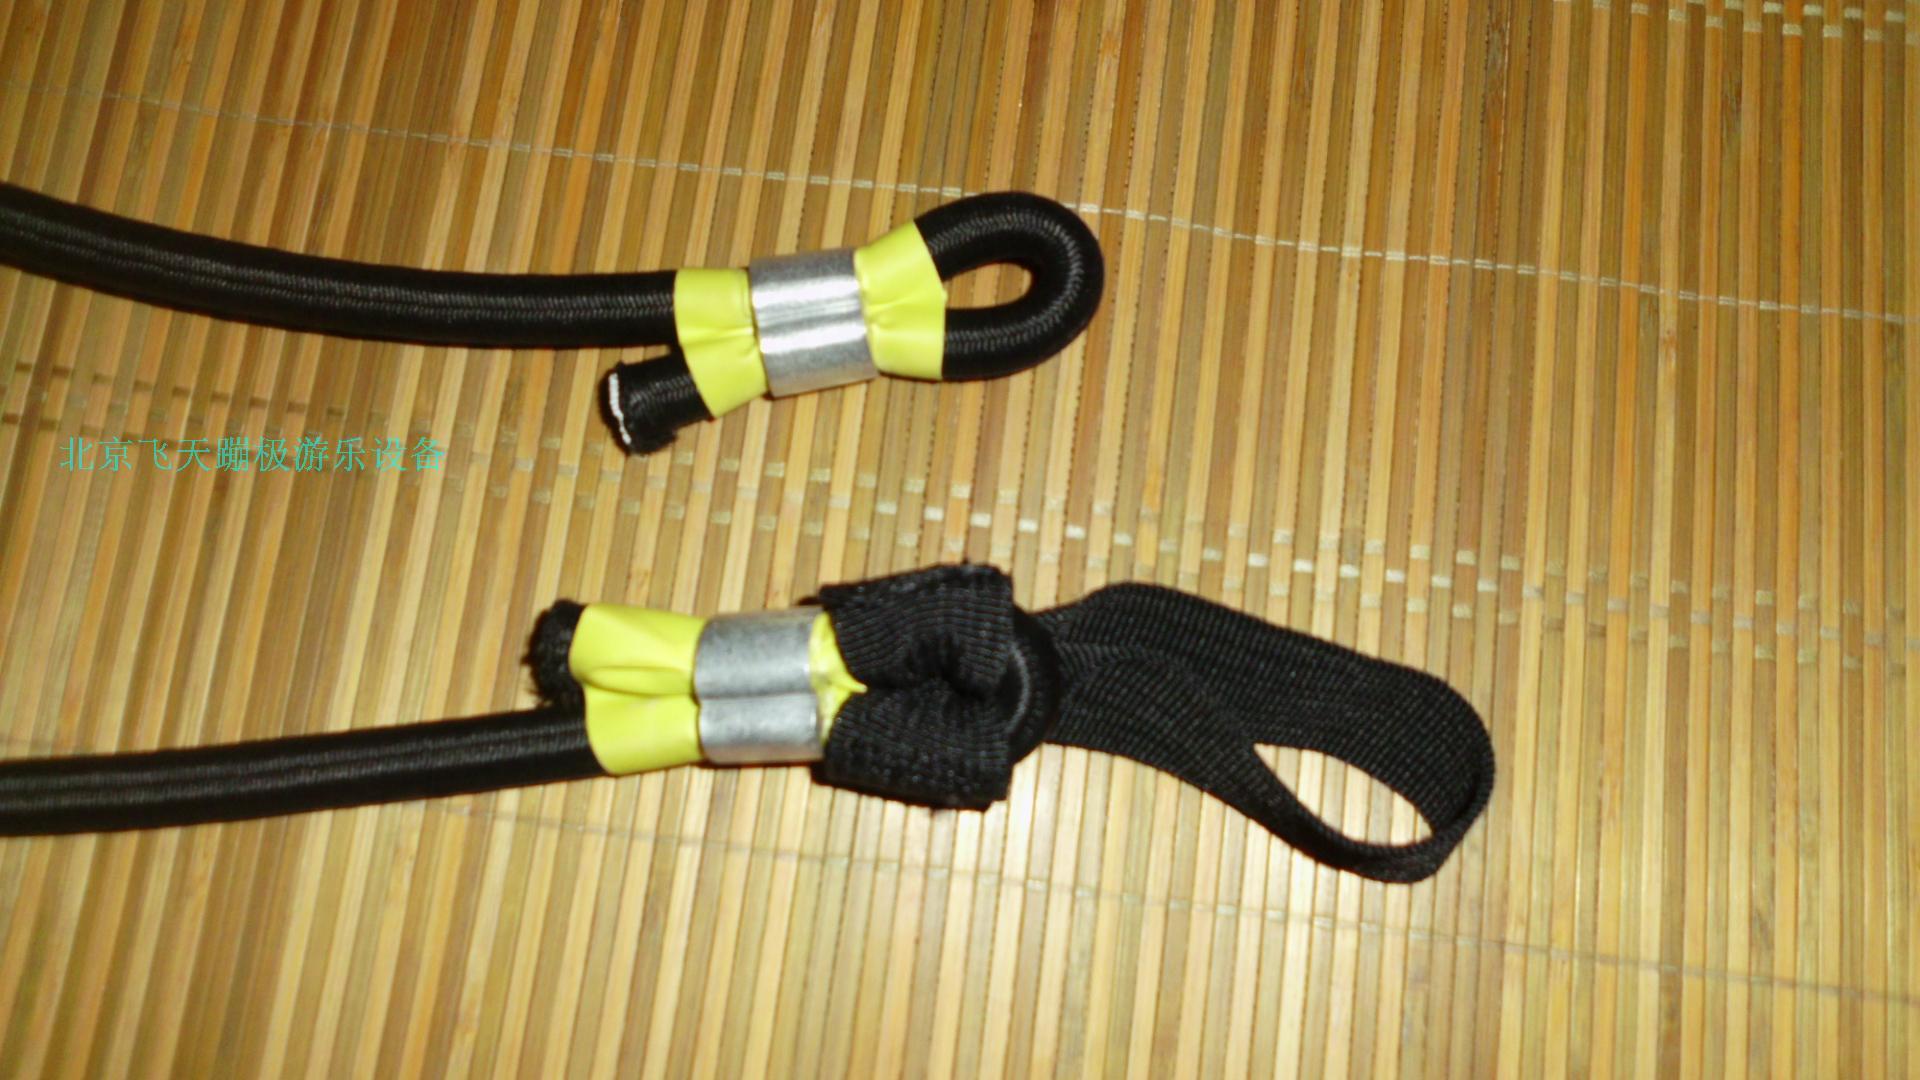 Батут Аксессуары упругие эластичные банджи взрослых банджи Банджи Шнуры батут батут тянутся веревки веревки веревки